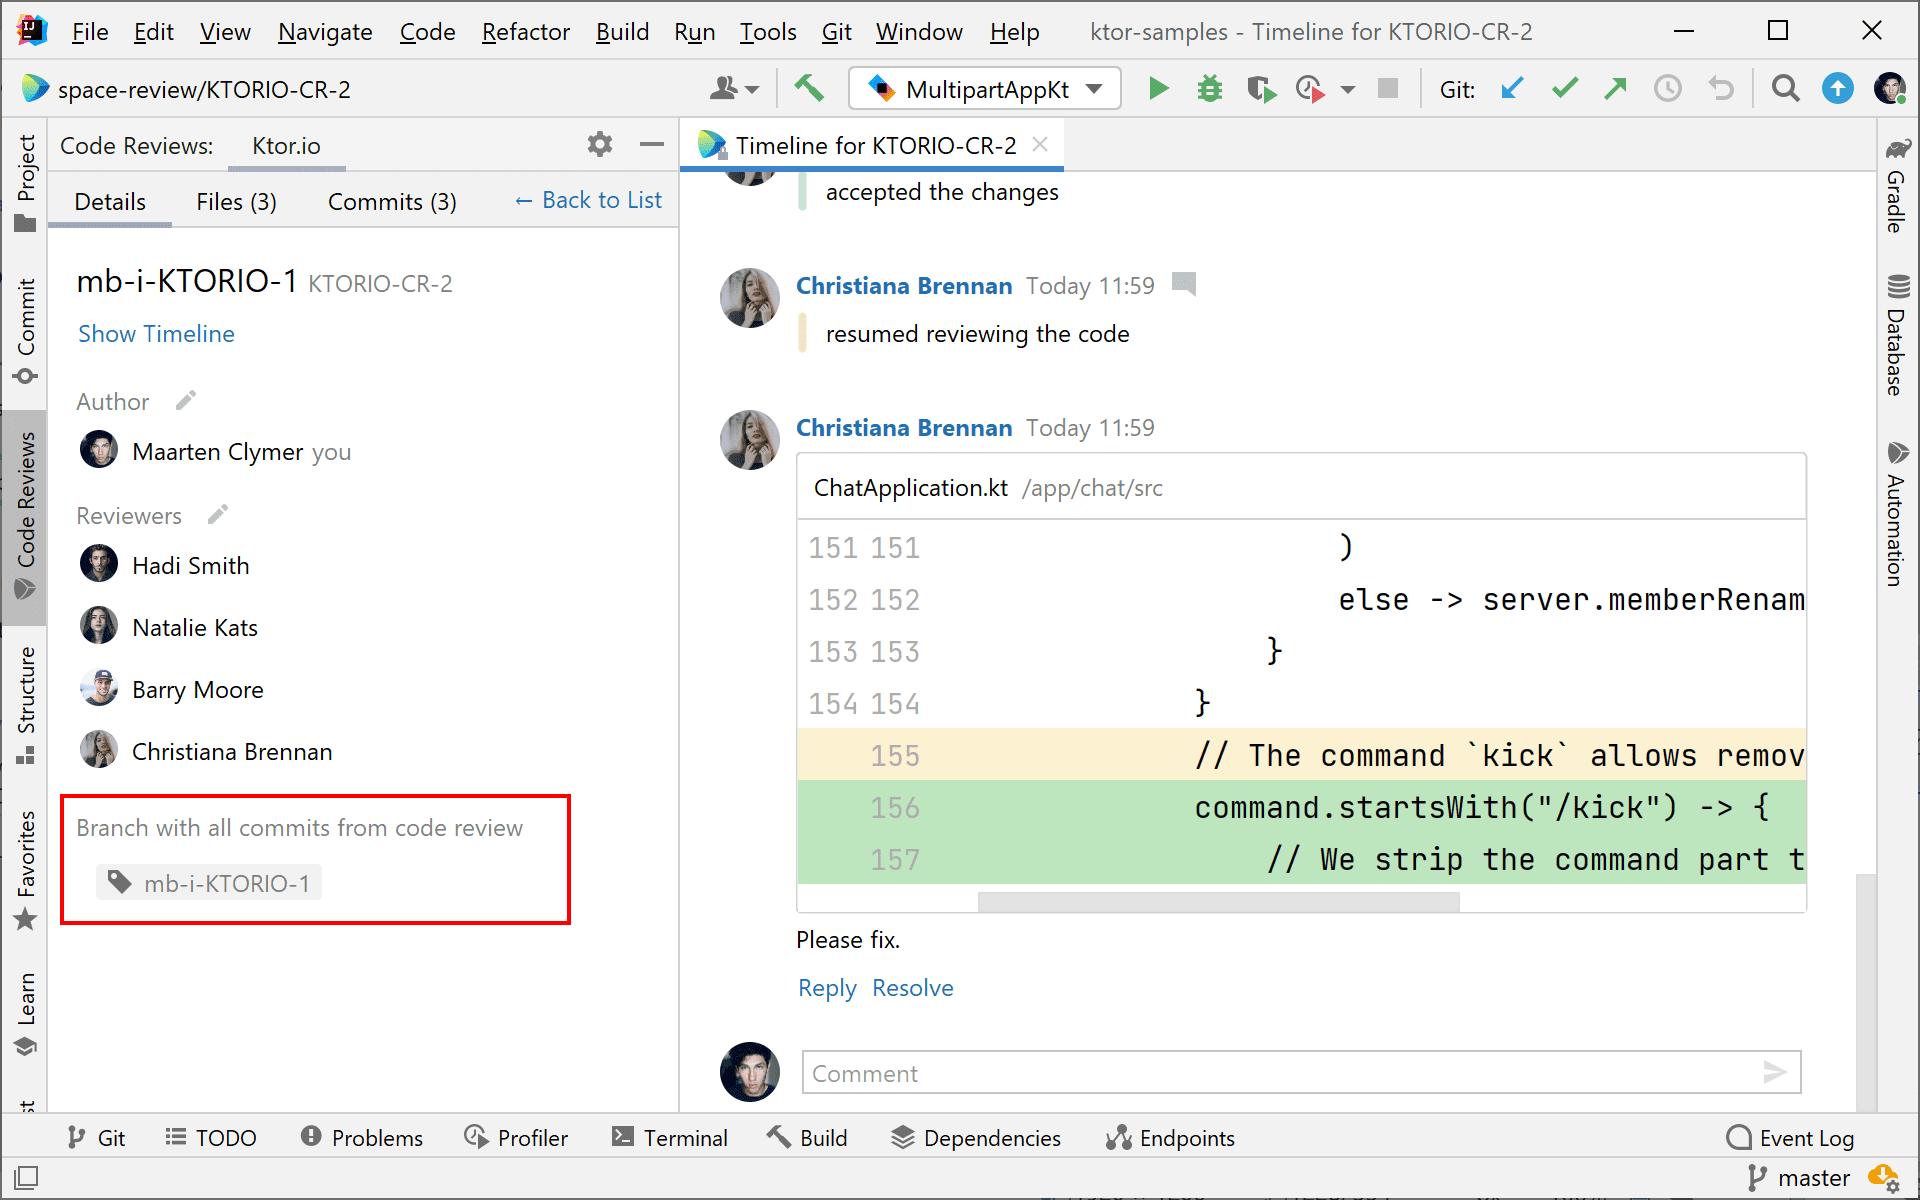 Branch display in code reviews